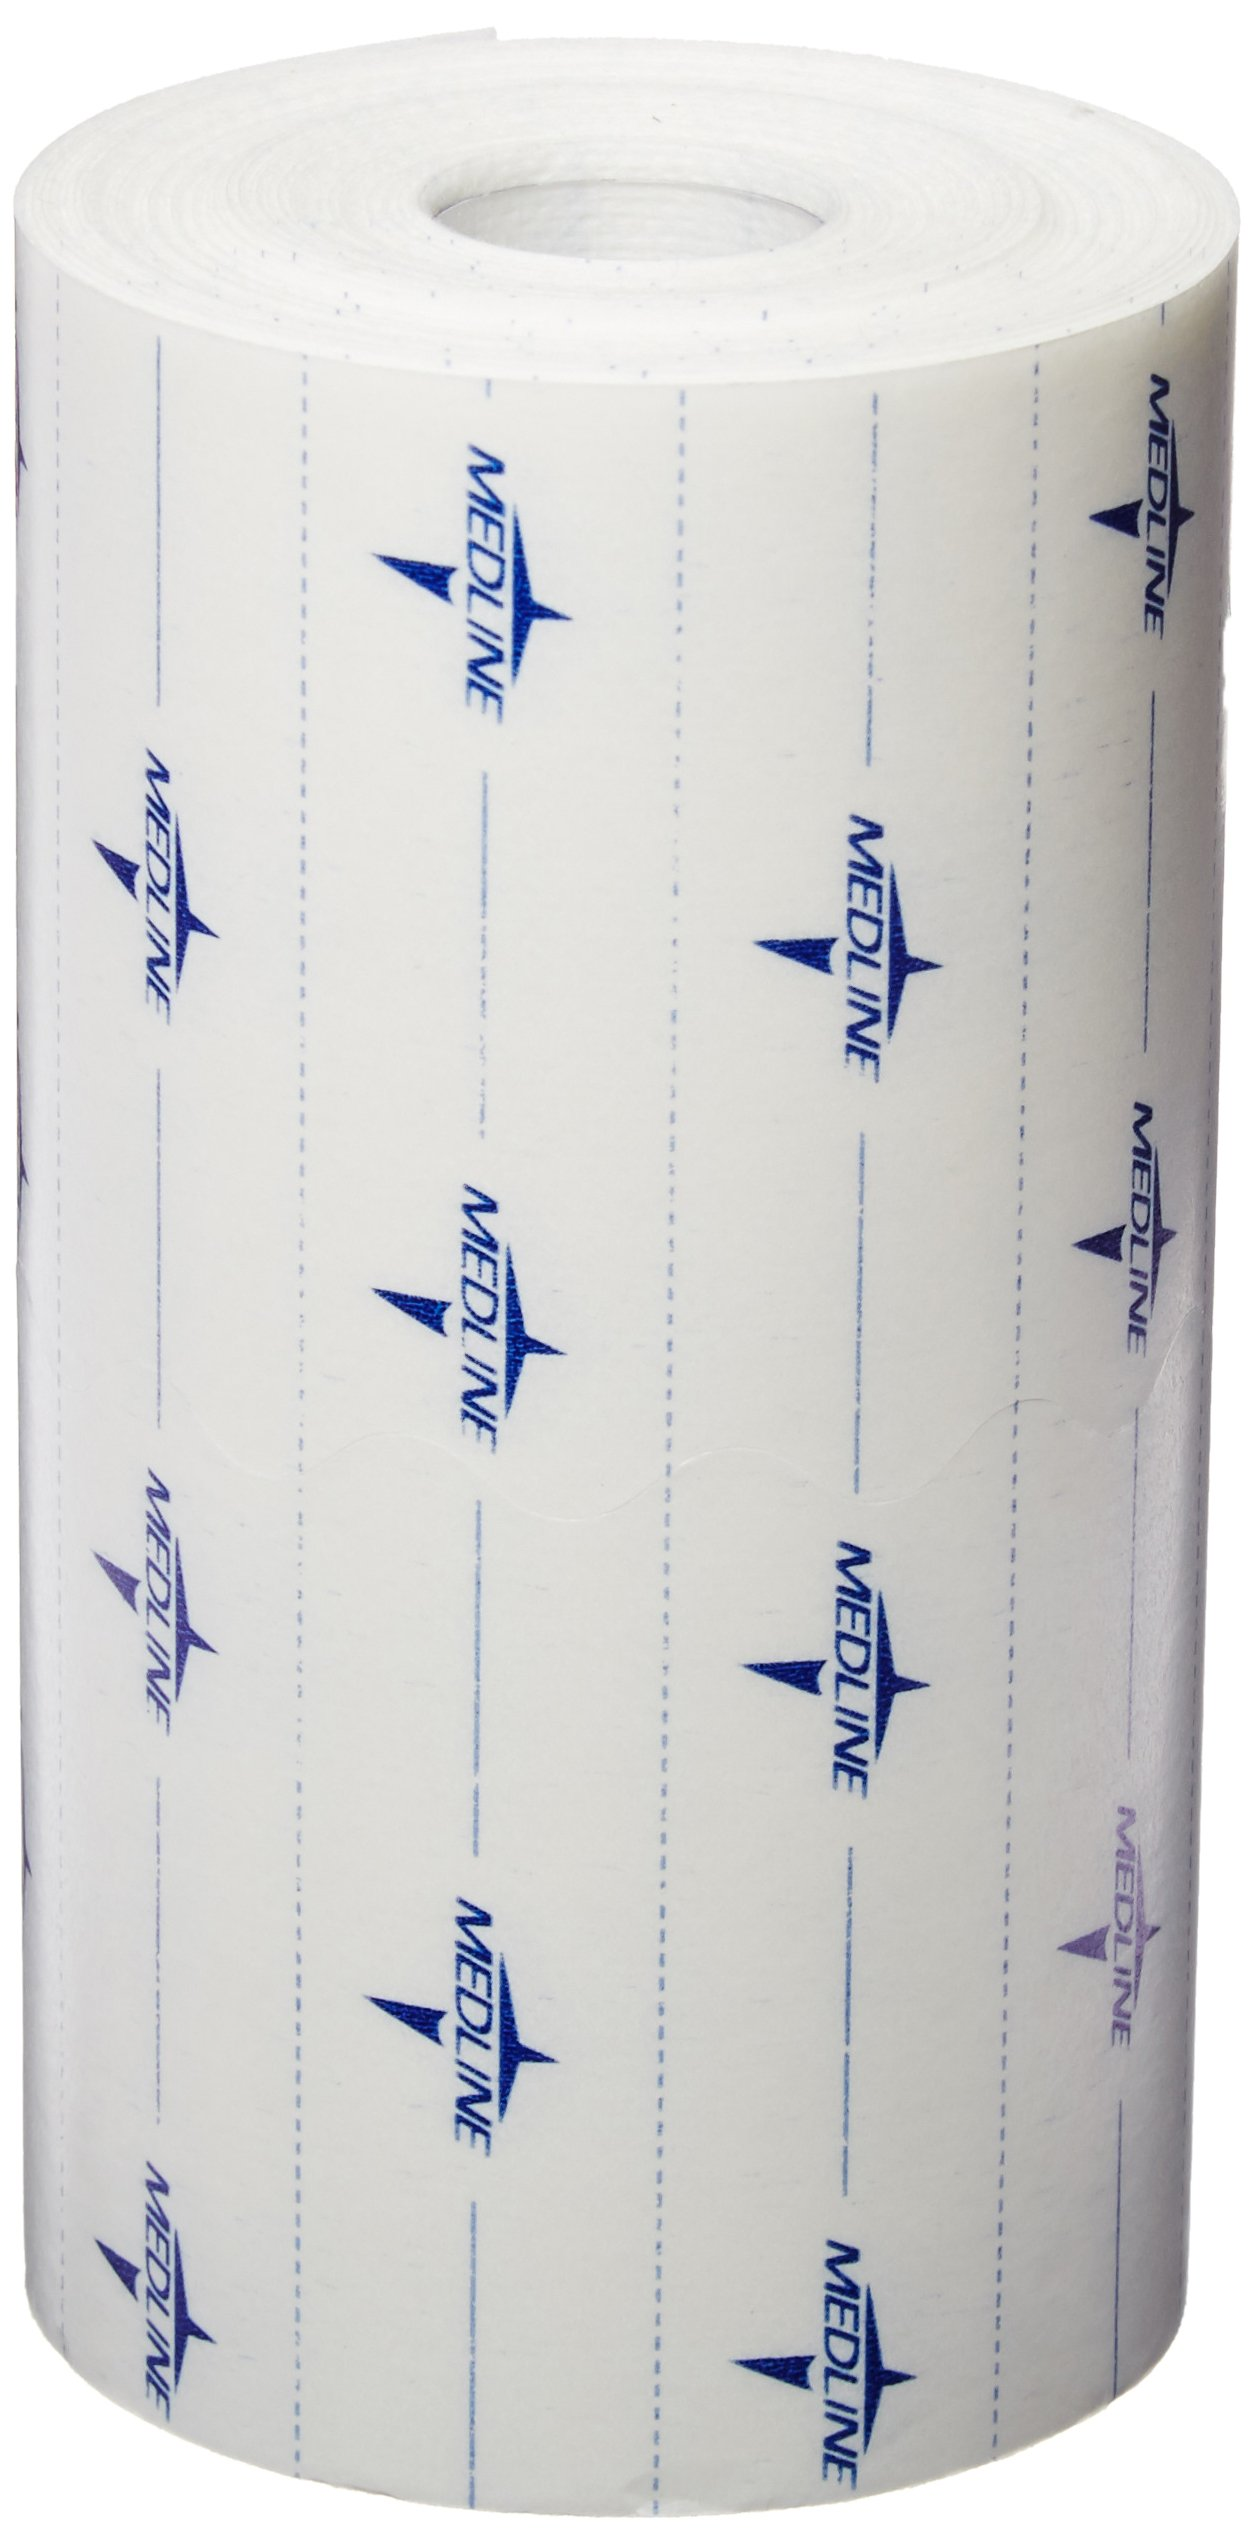 Medline MSC4006 MedFix Retention Dressing Tapes, 6'' x 11 yd